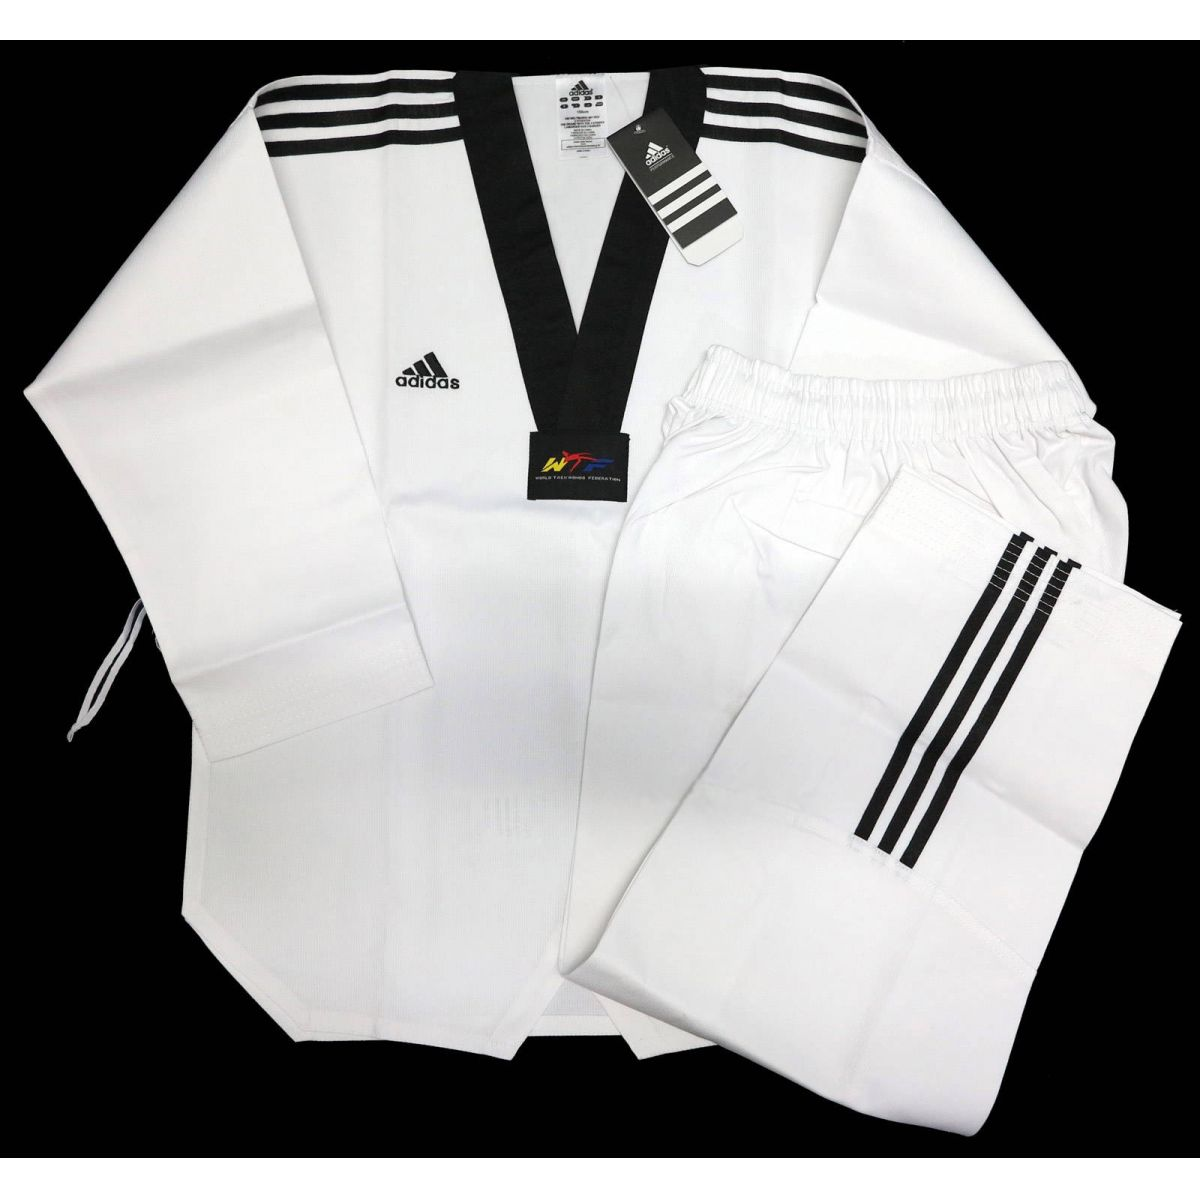 Dobok Adidas Adiclub Gola Preta (Taekwondo)